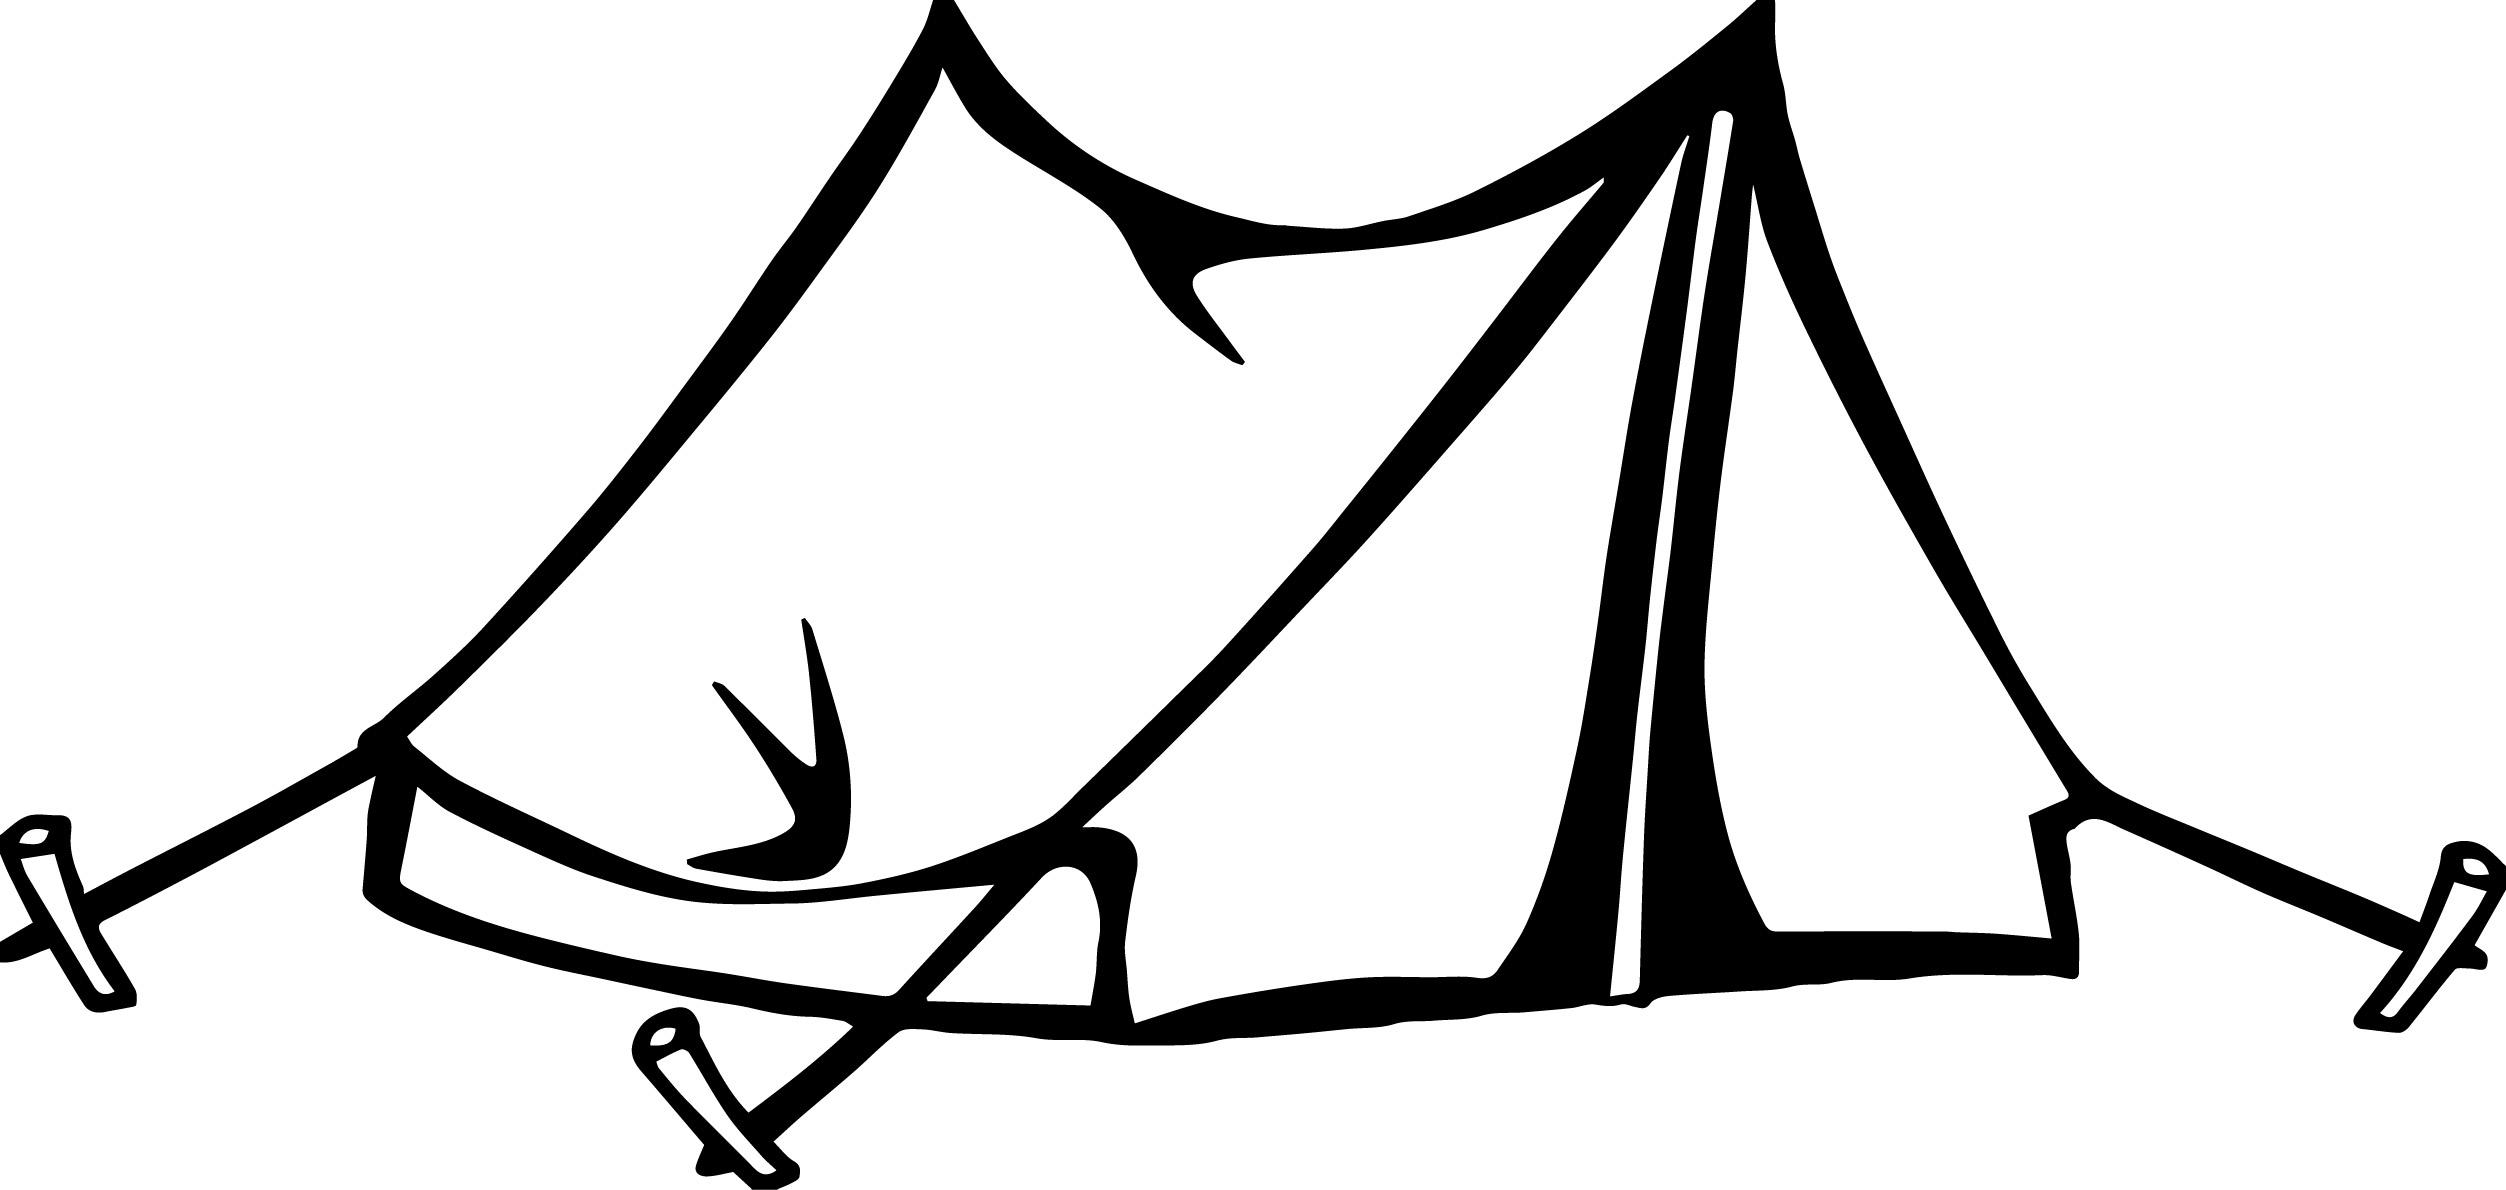 Tent Coloring, Download Tent Coloring